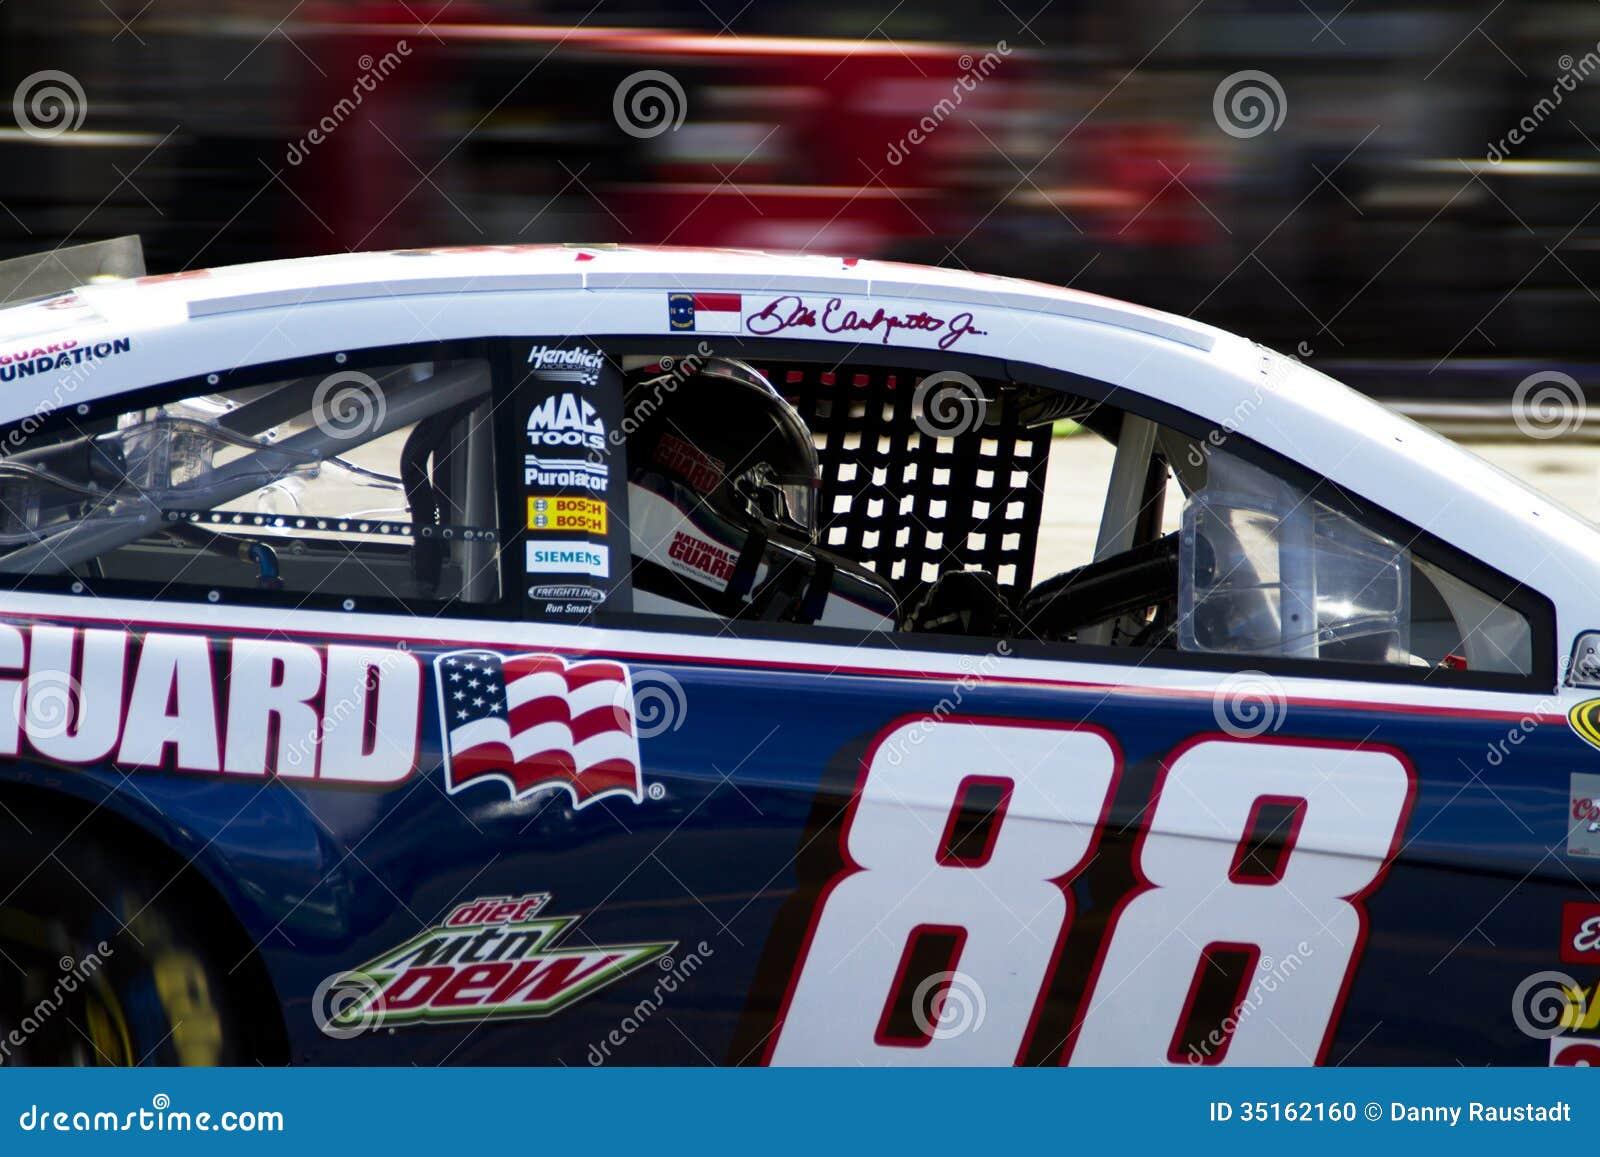 Race Car Sets >> NASCAR Dale Earnhardt Jr. At Phoenix International Raceway Editorial Image - Image: 35162160